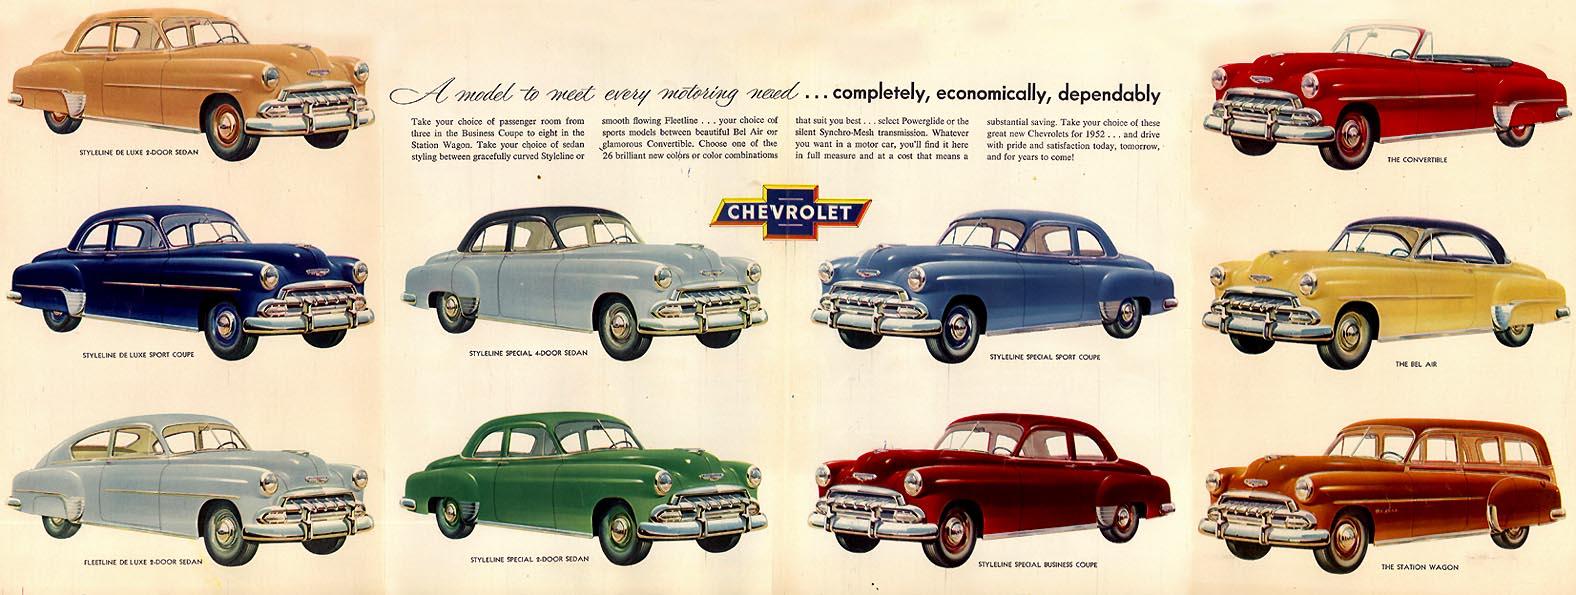 Chevrolet Bel air 1952 foto - 2